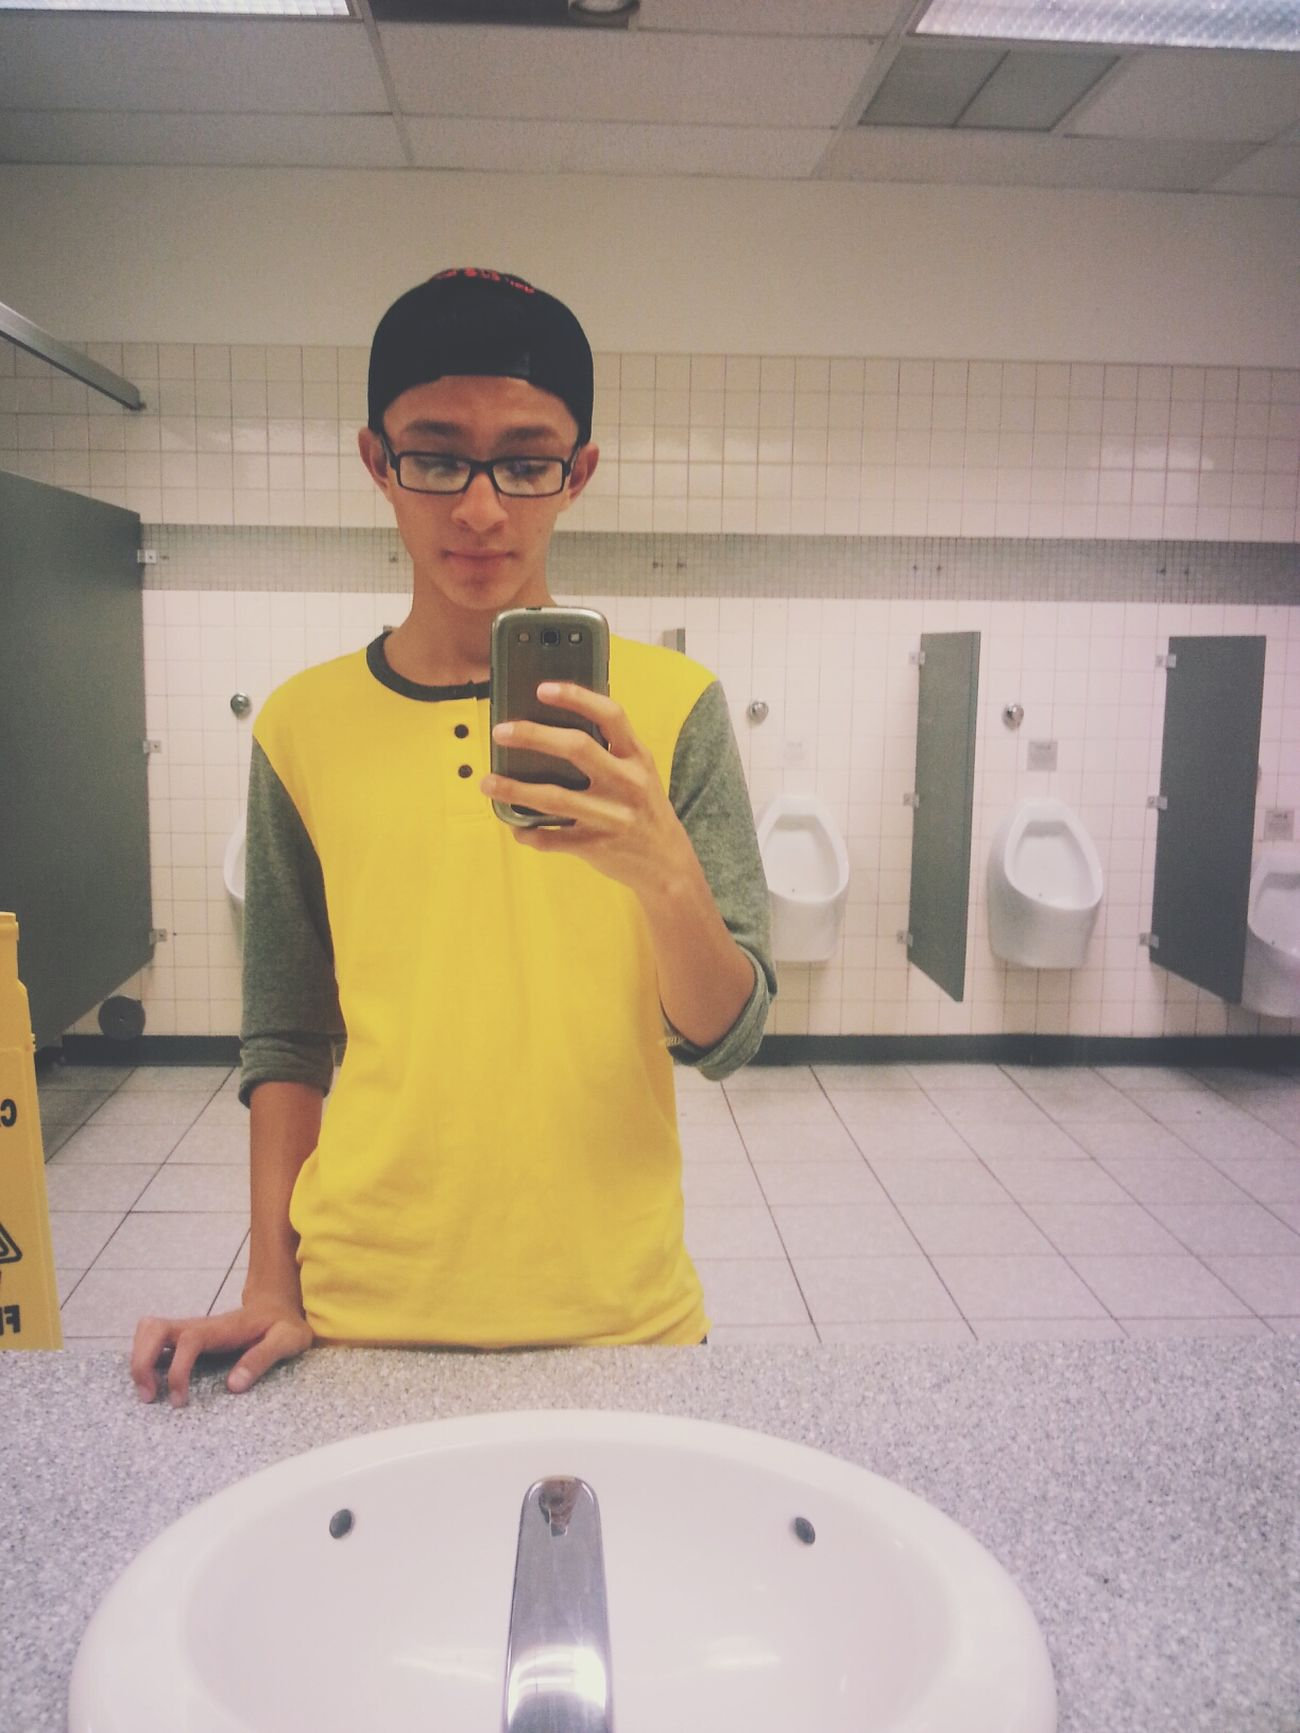 Yass my first photo xD